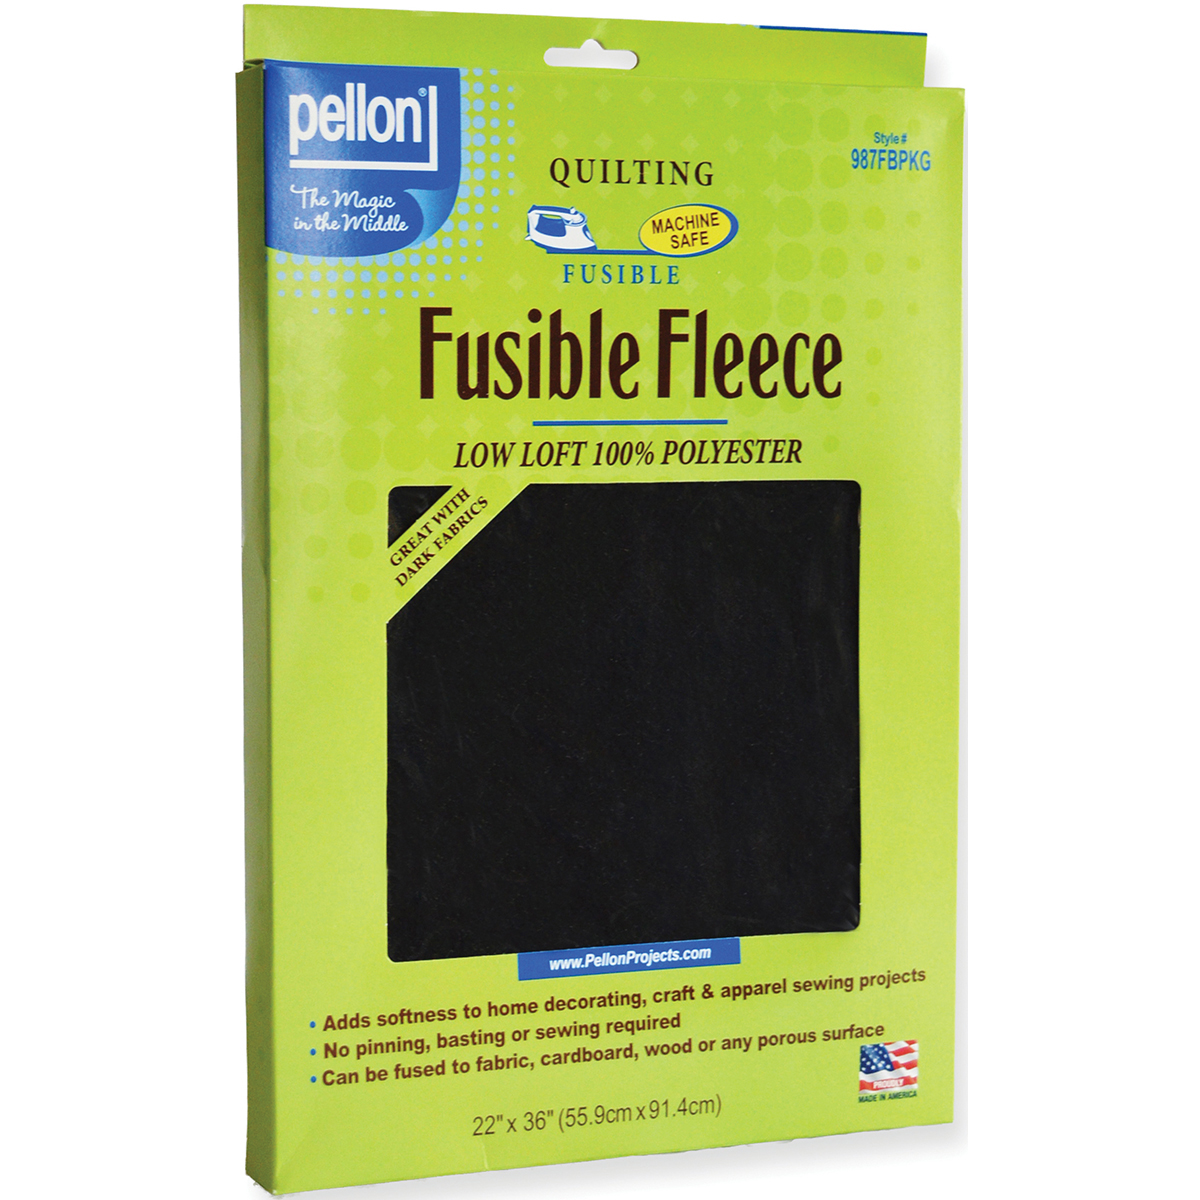 "Fusible Fleece, 22"" x 36"", Black"